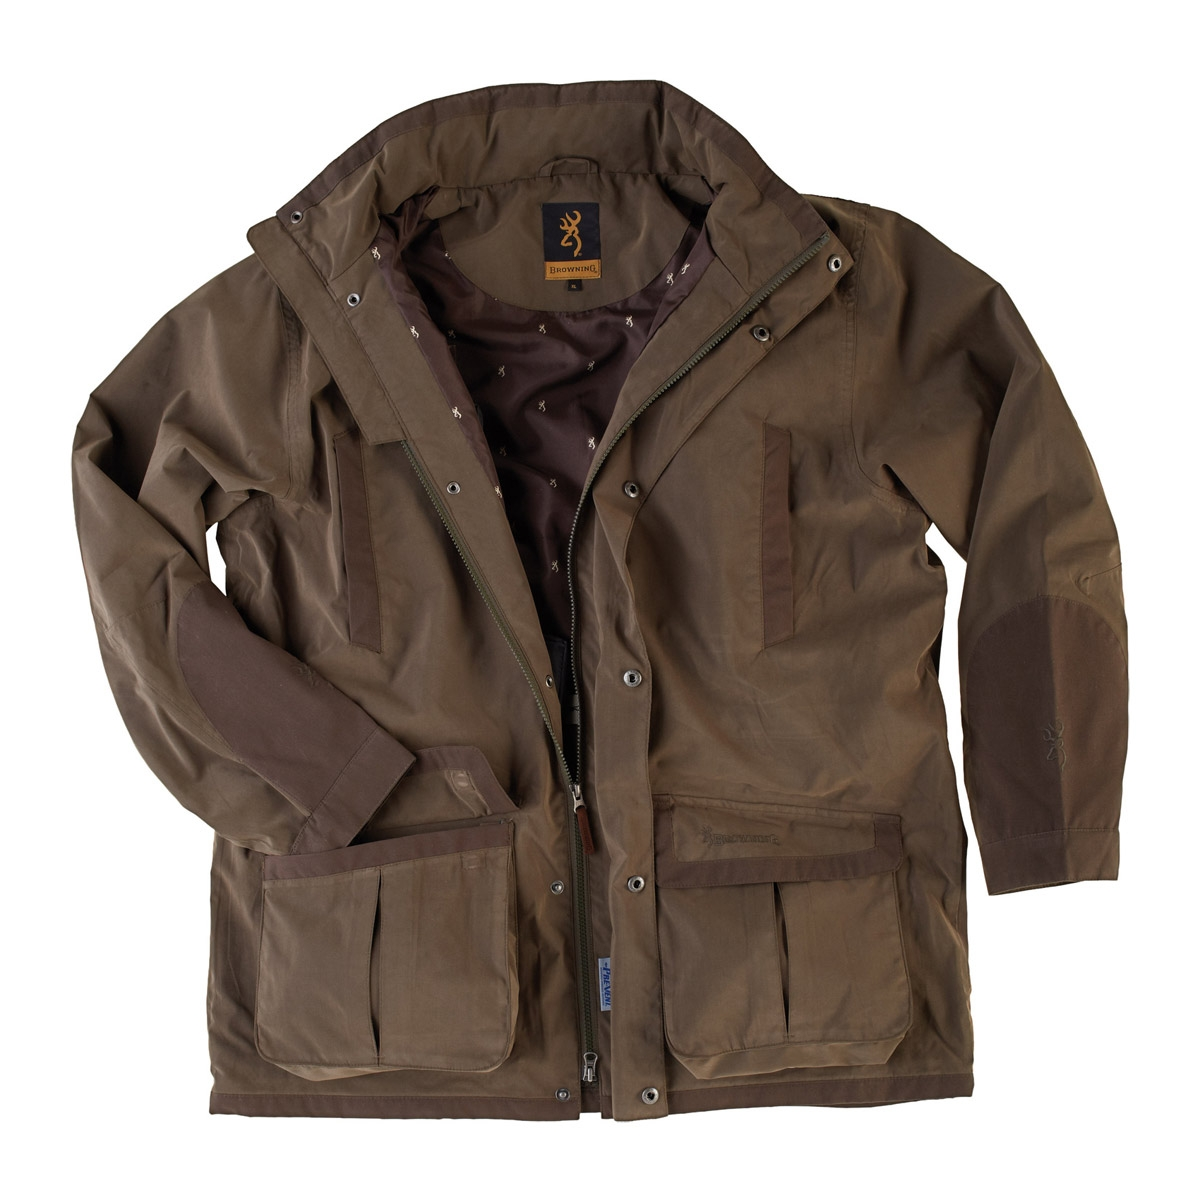 683117d6f7a68 Browning Upland Hunter 2 Parka Jacket - Green | Uttings.co.uk